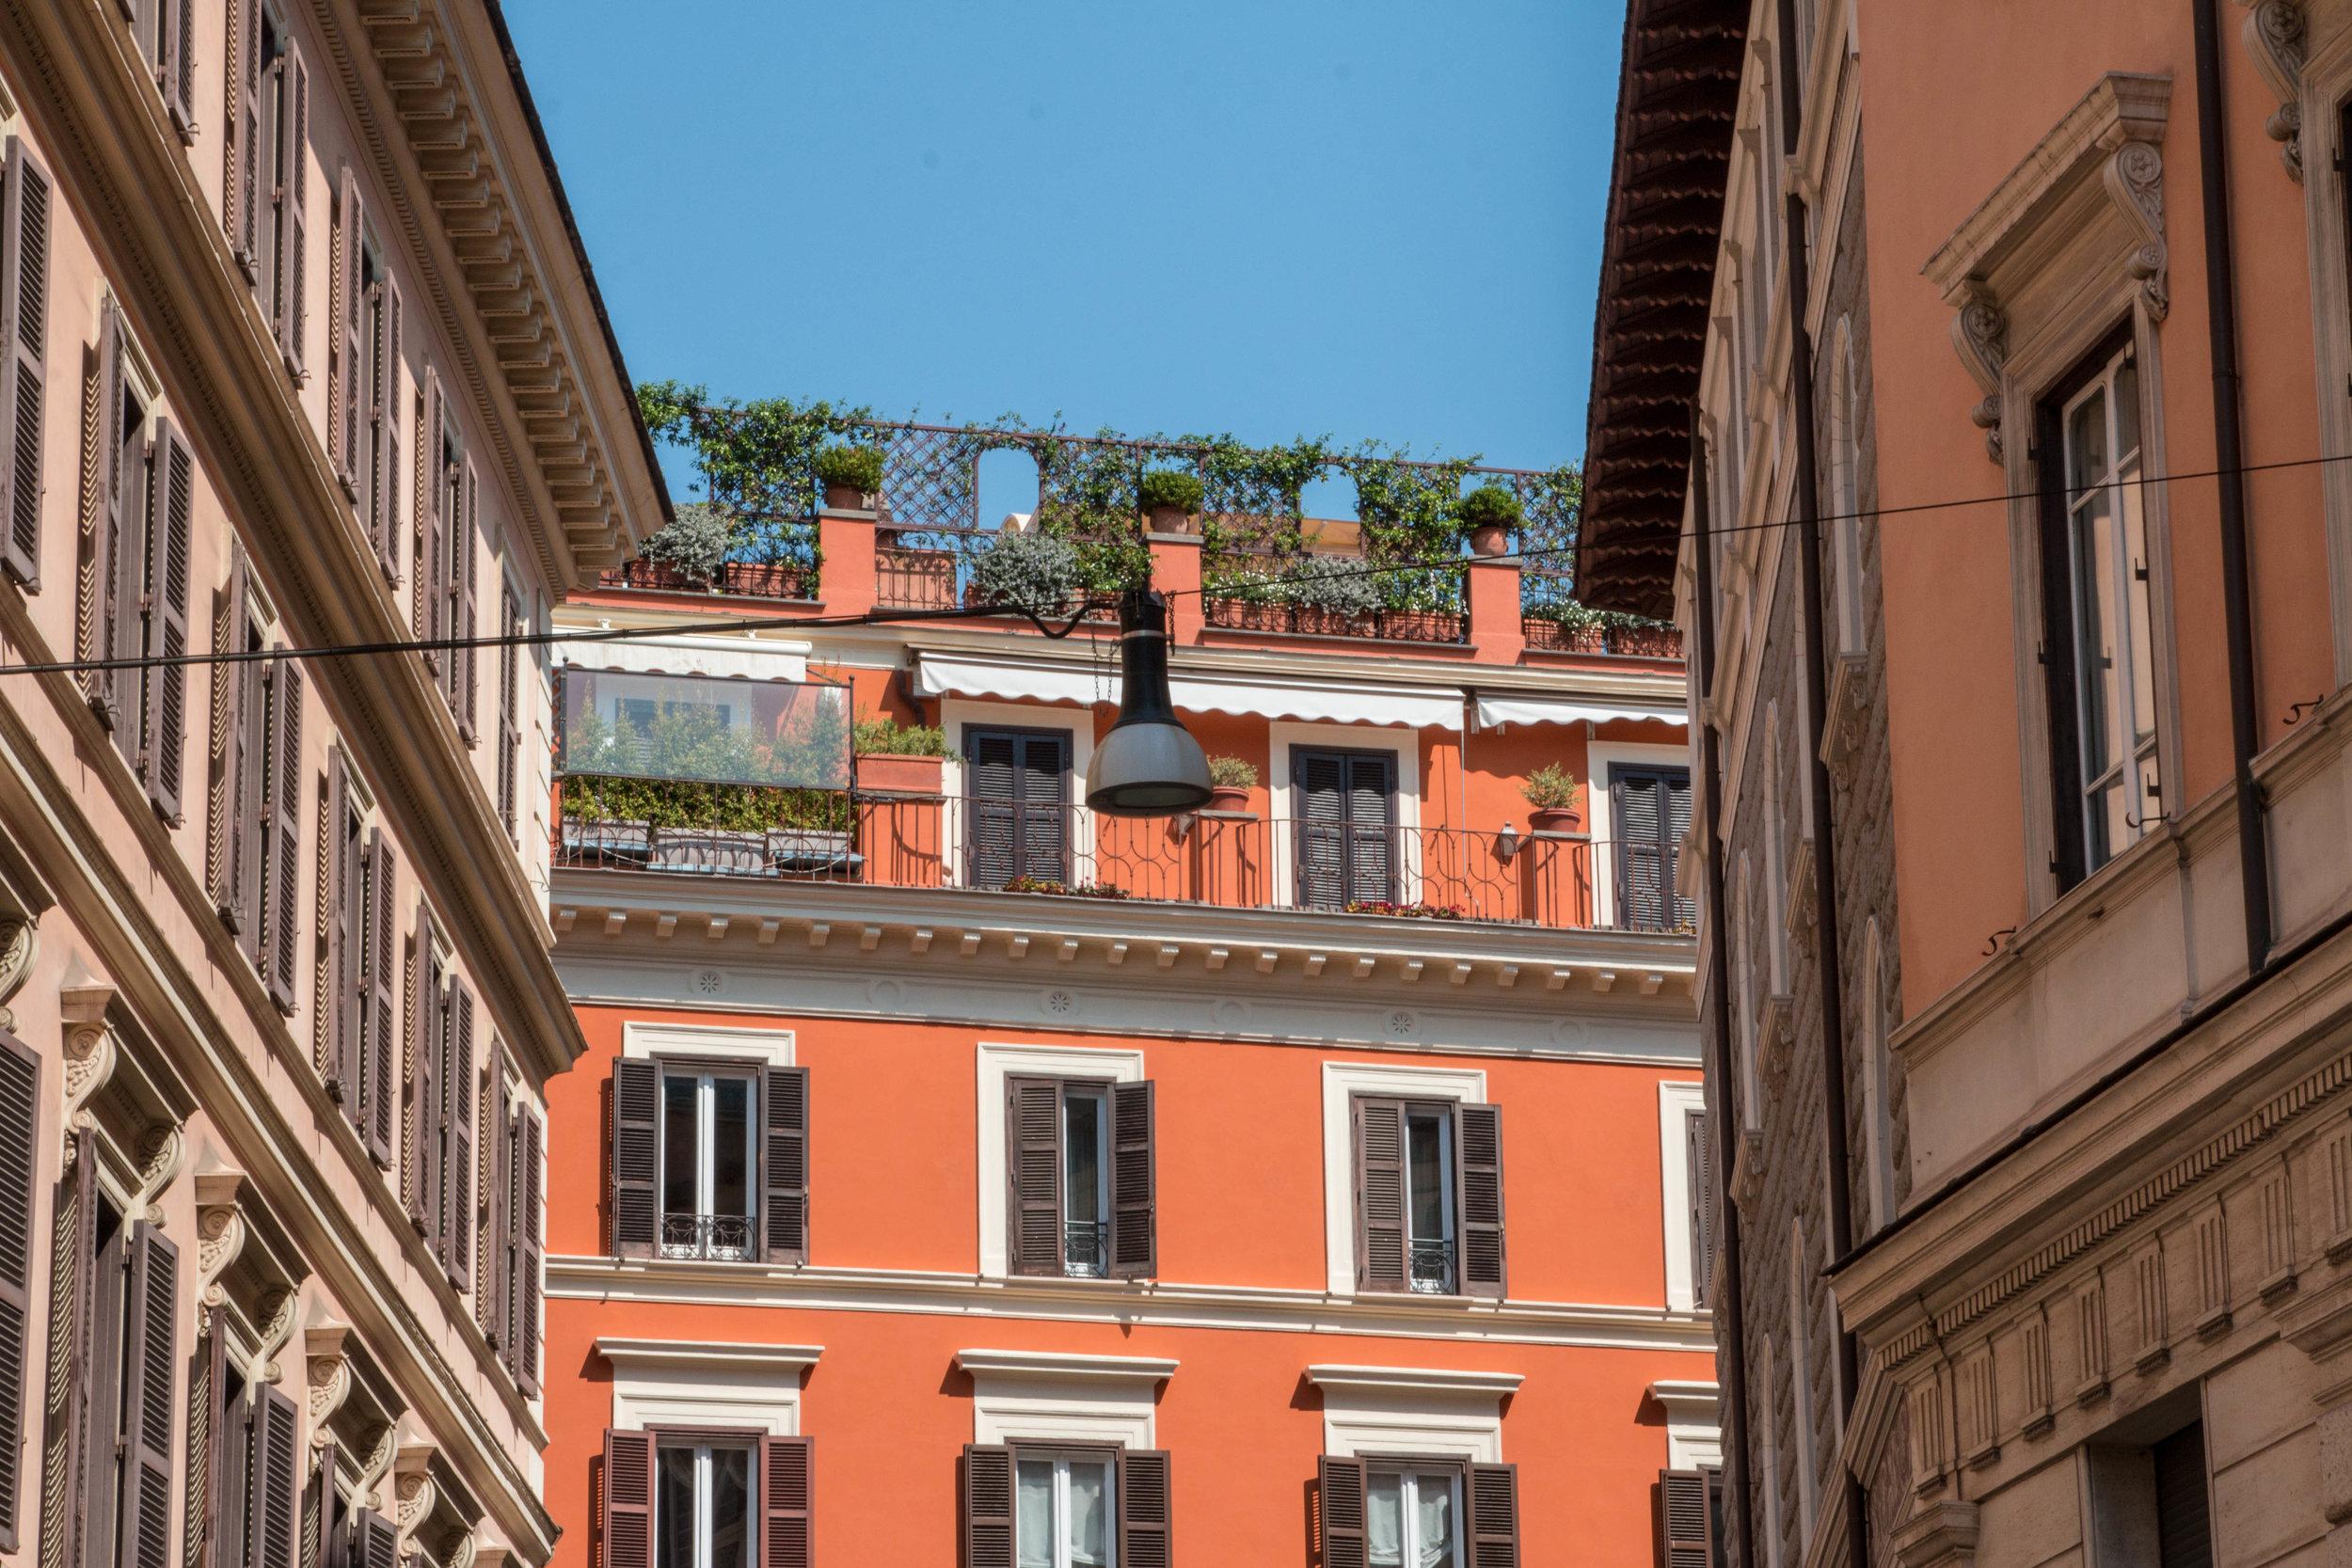 20180422-Italy Trip- 3912.jpg